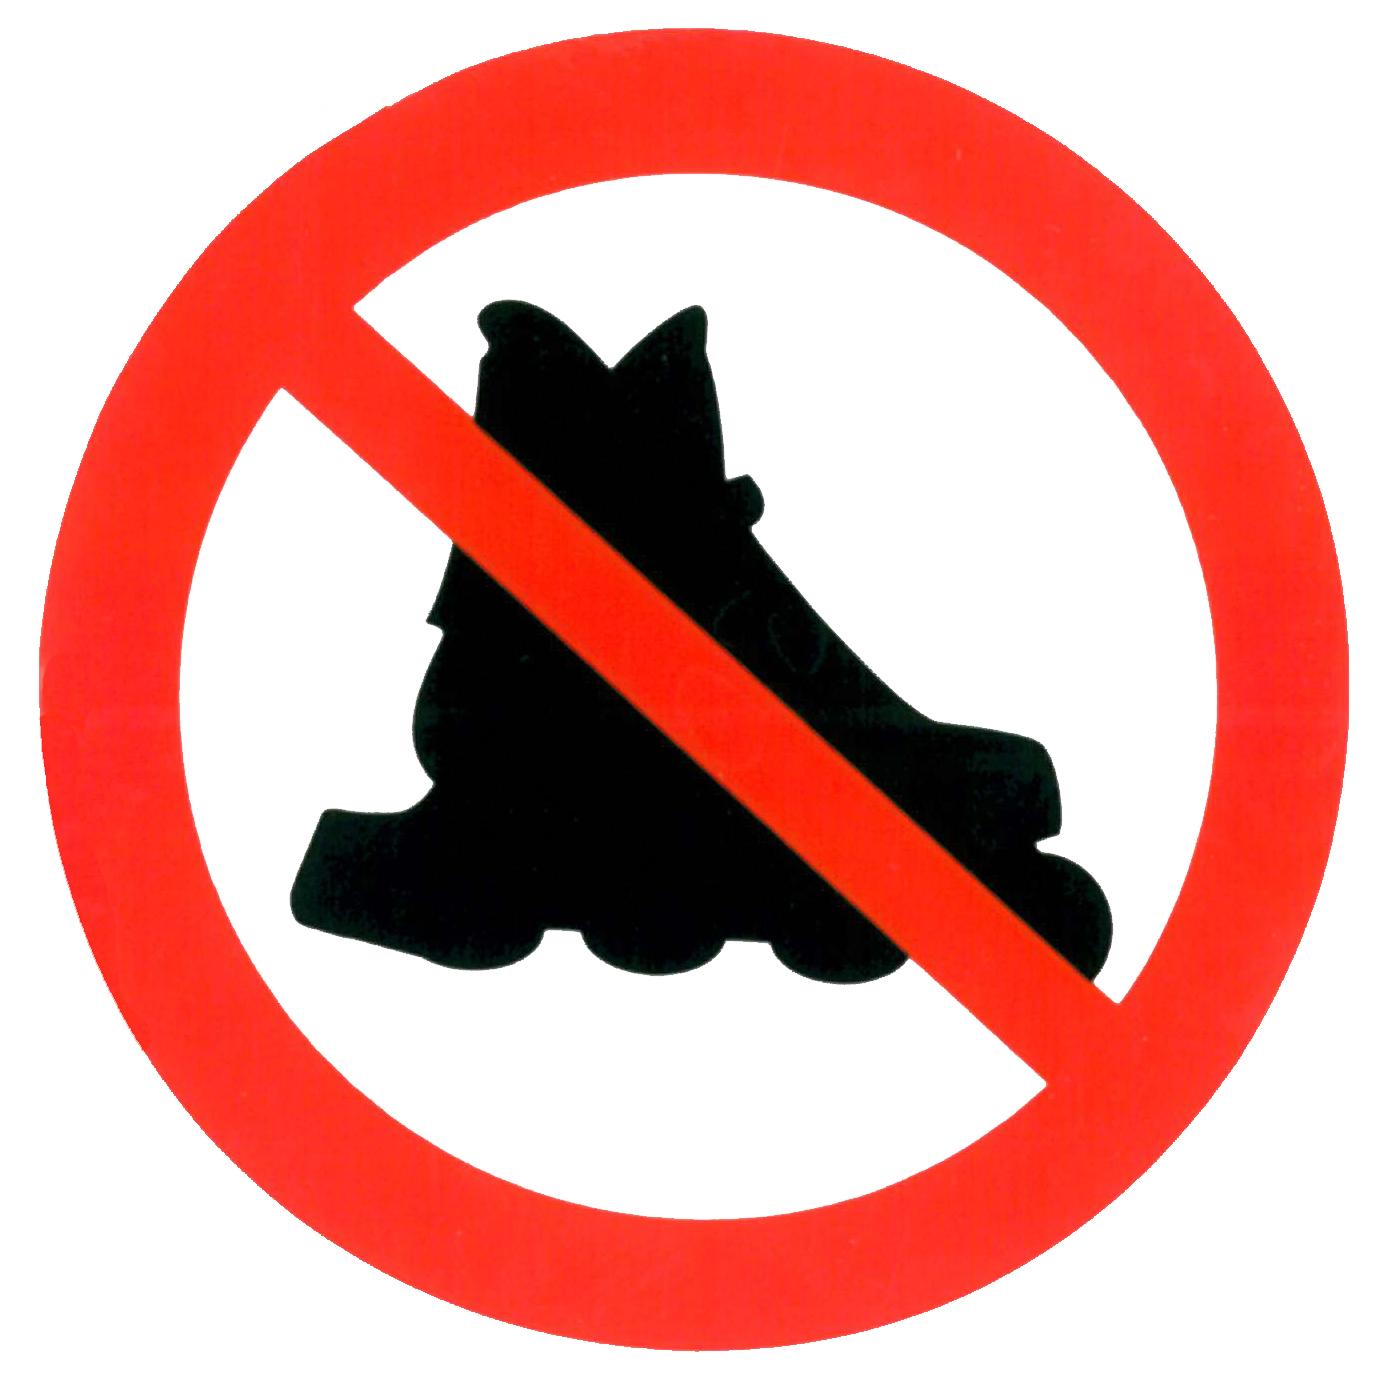 Piktogramm V20580: Verbot für Inline-Skates